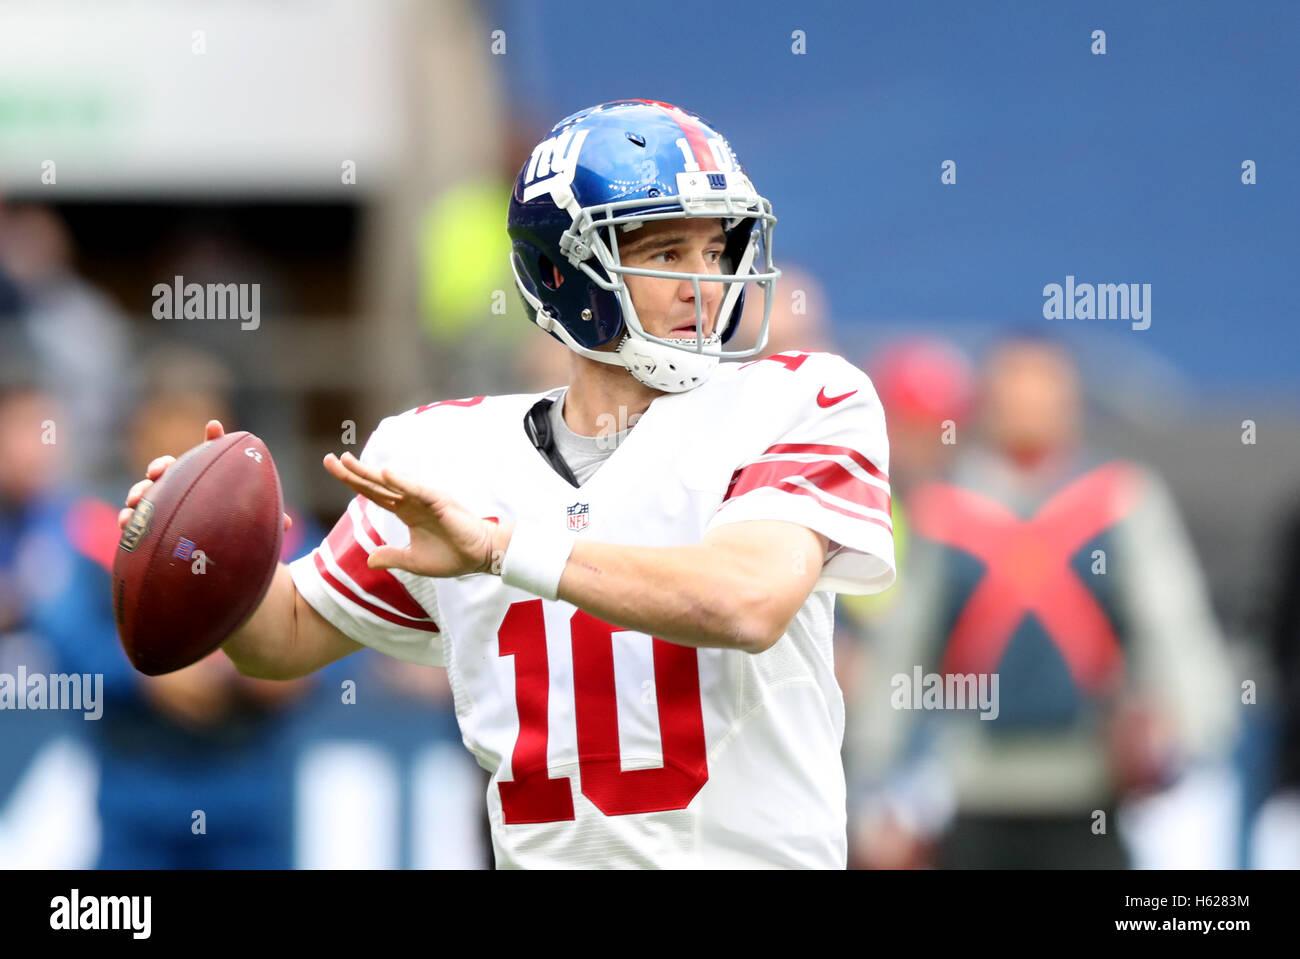 New York Giants Eli Manning während der NFL International Series match in Twickenham, London. Stockbild